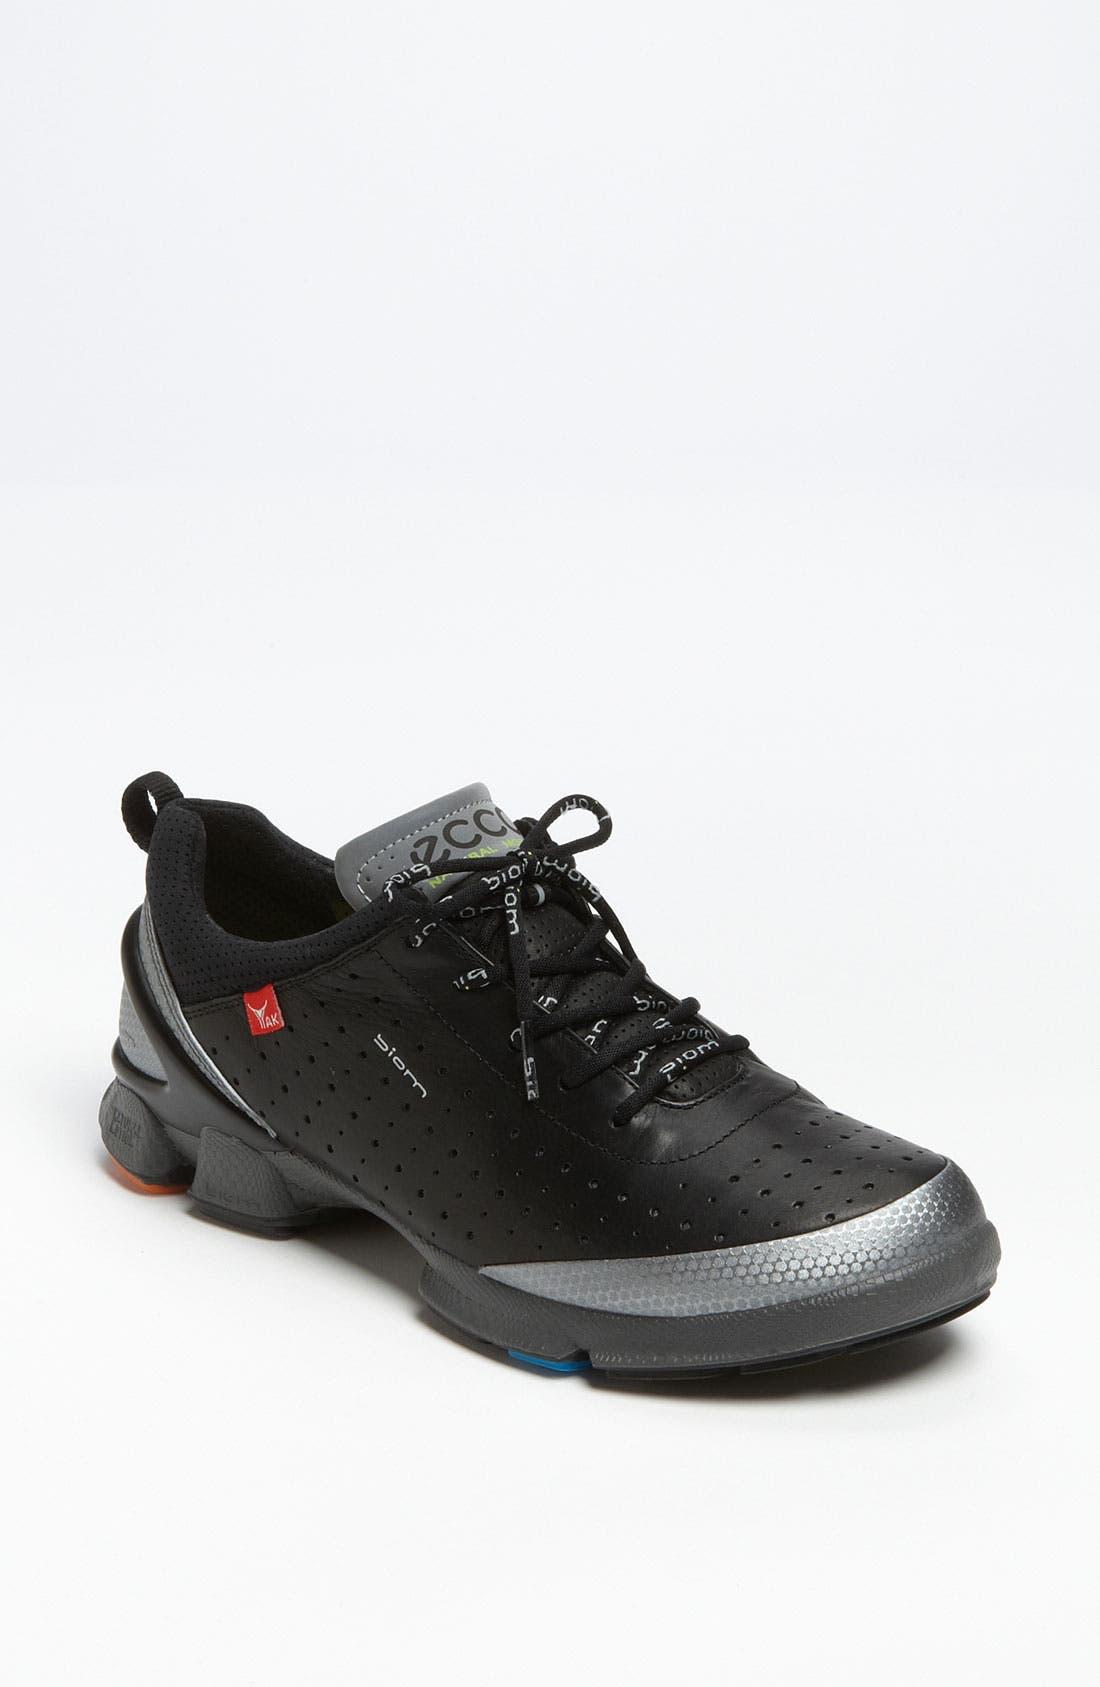 Main Image - ECCO 'Biom Walk' Sneaker (Women)